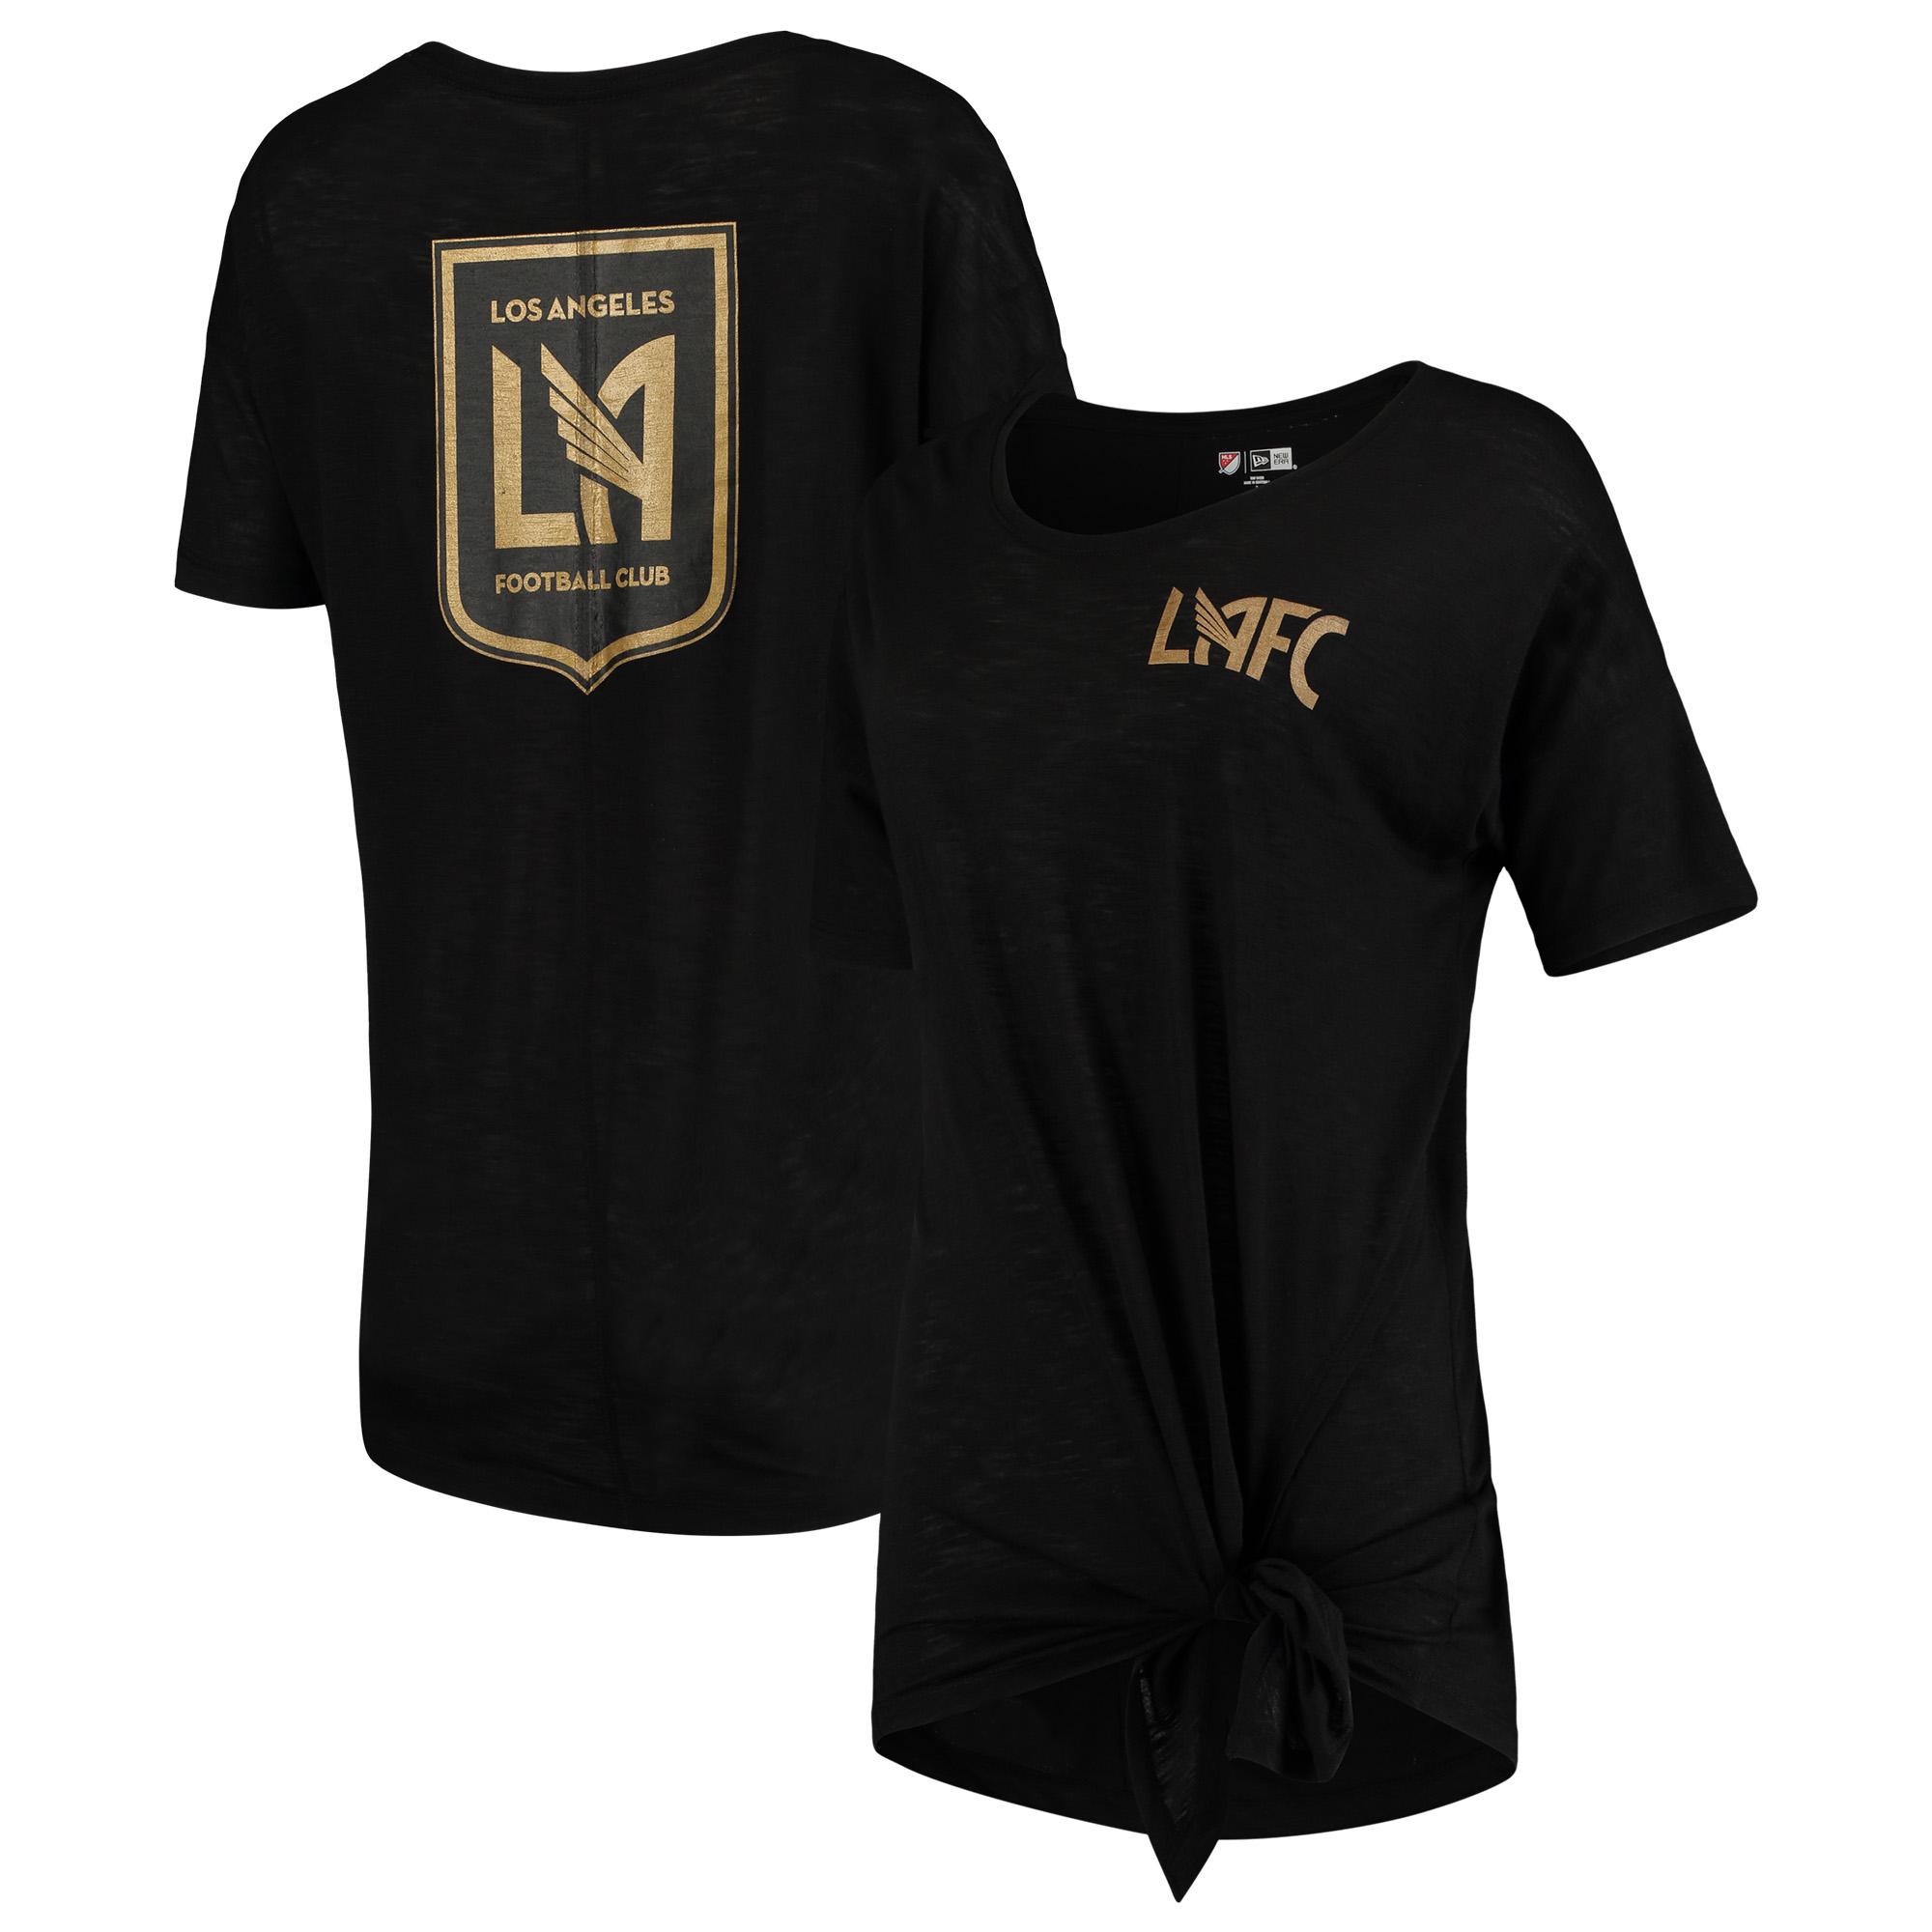 LAFC 5th & Ocean by New Era Women's Slub T-Shirt - Black